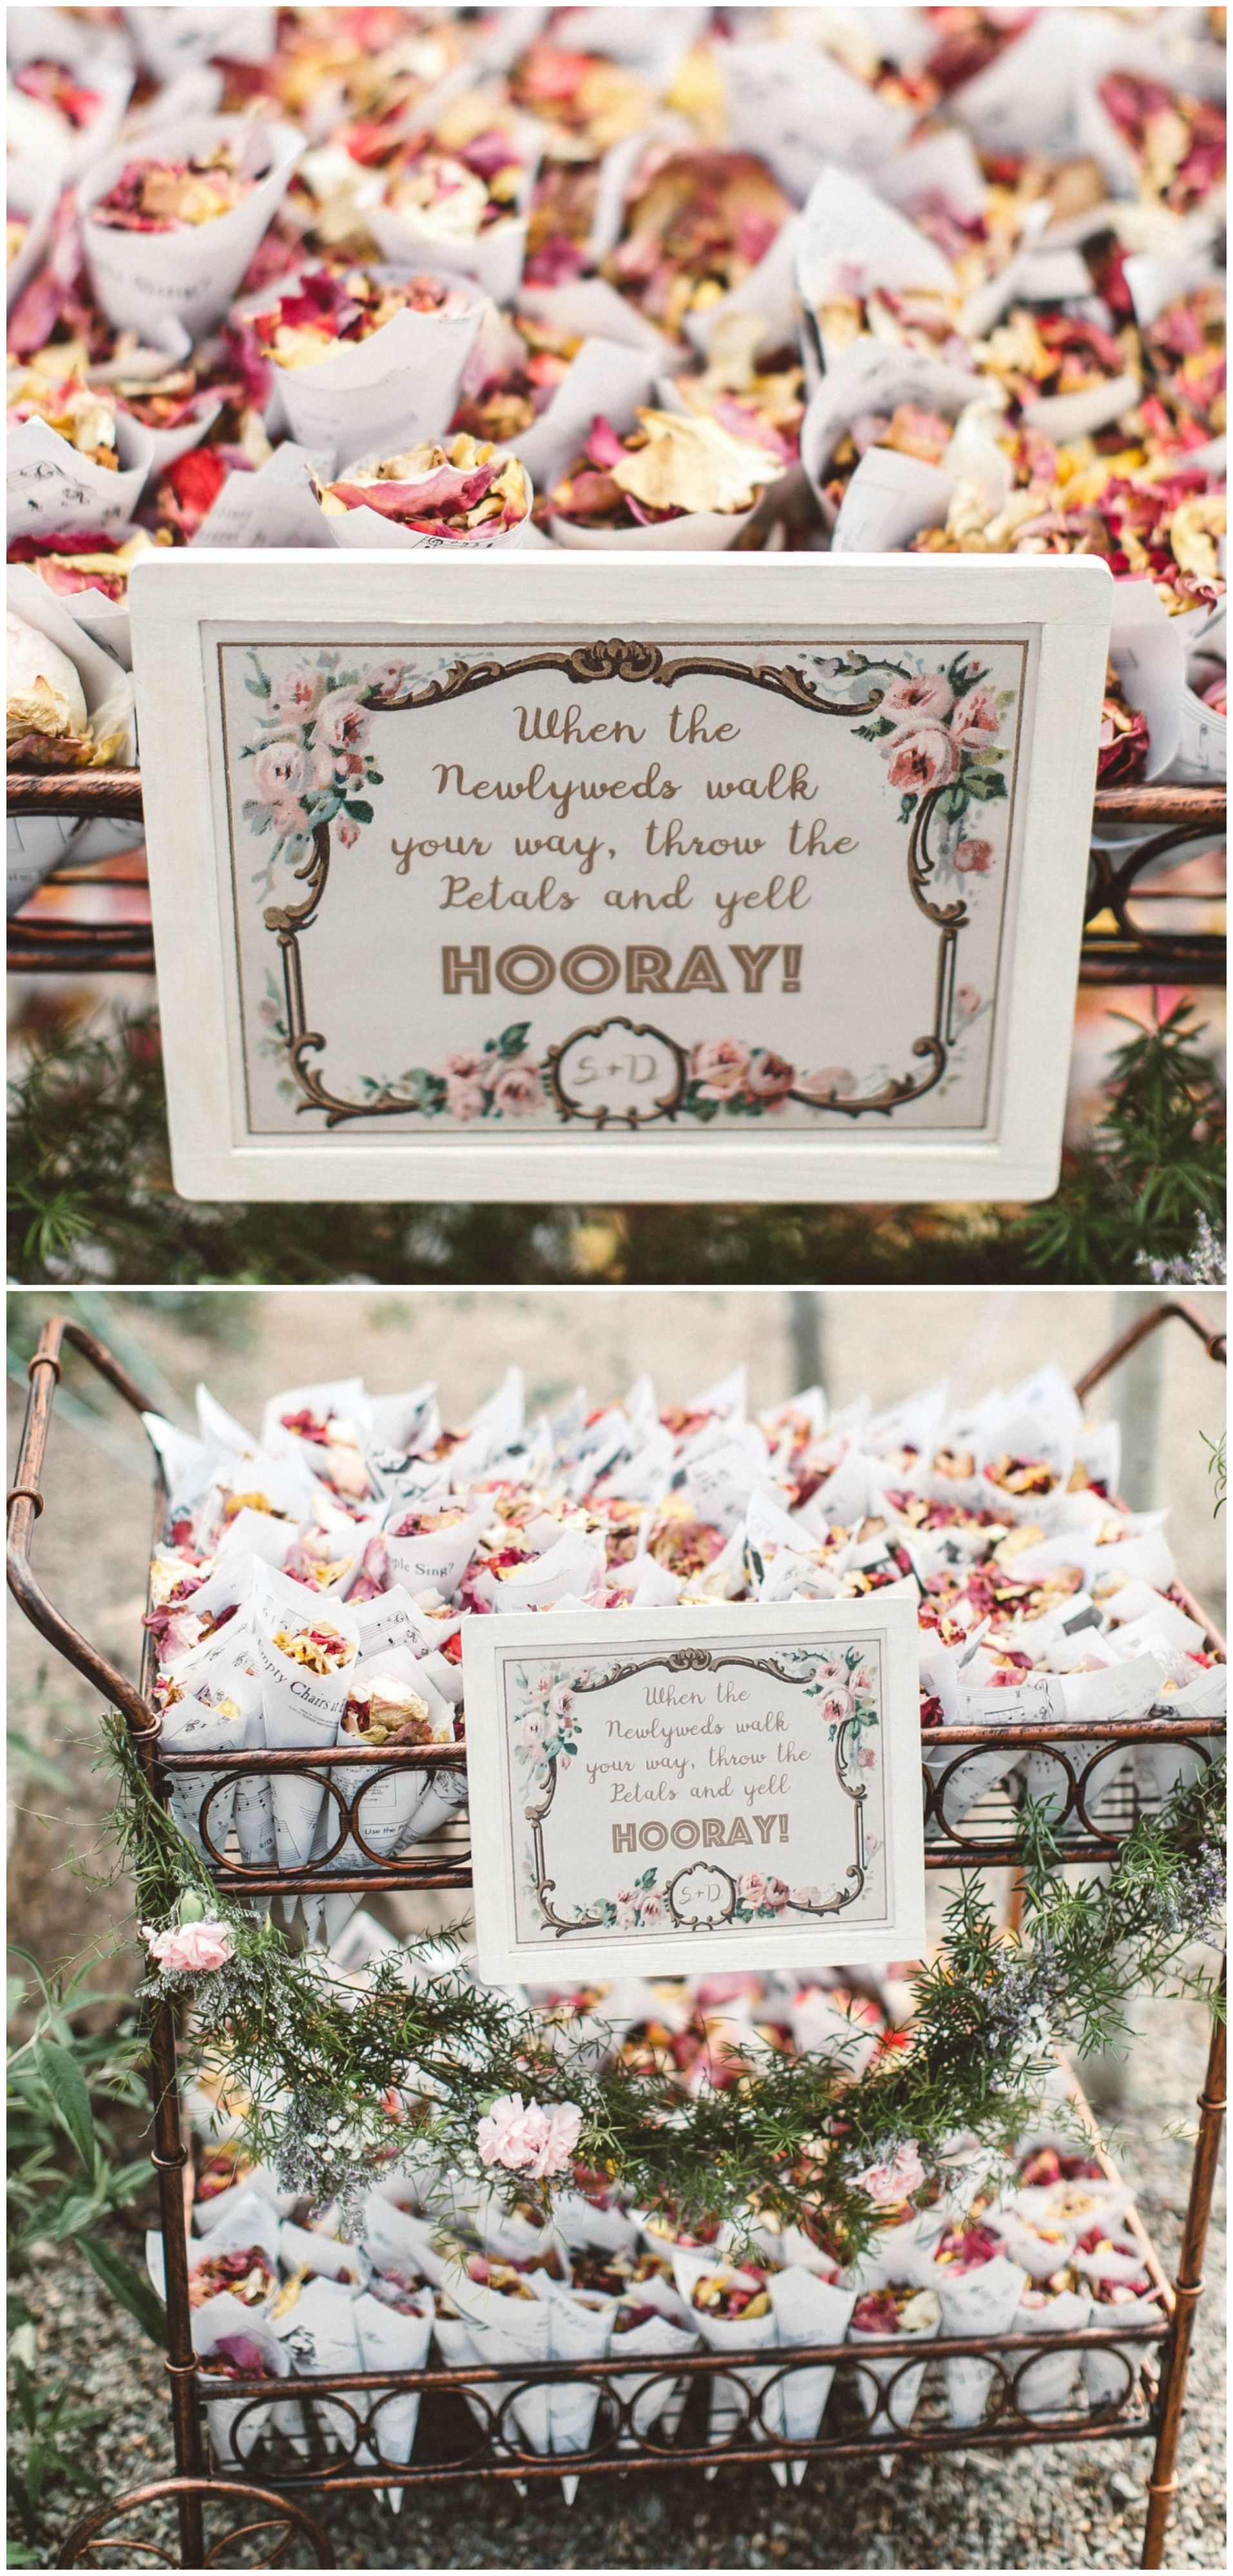 Petal toss, ceremony ideas, exit ideas, vintage iron cart